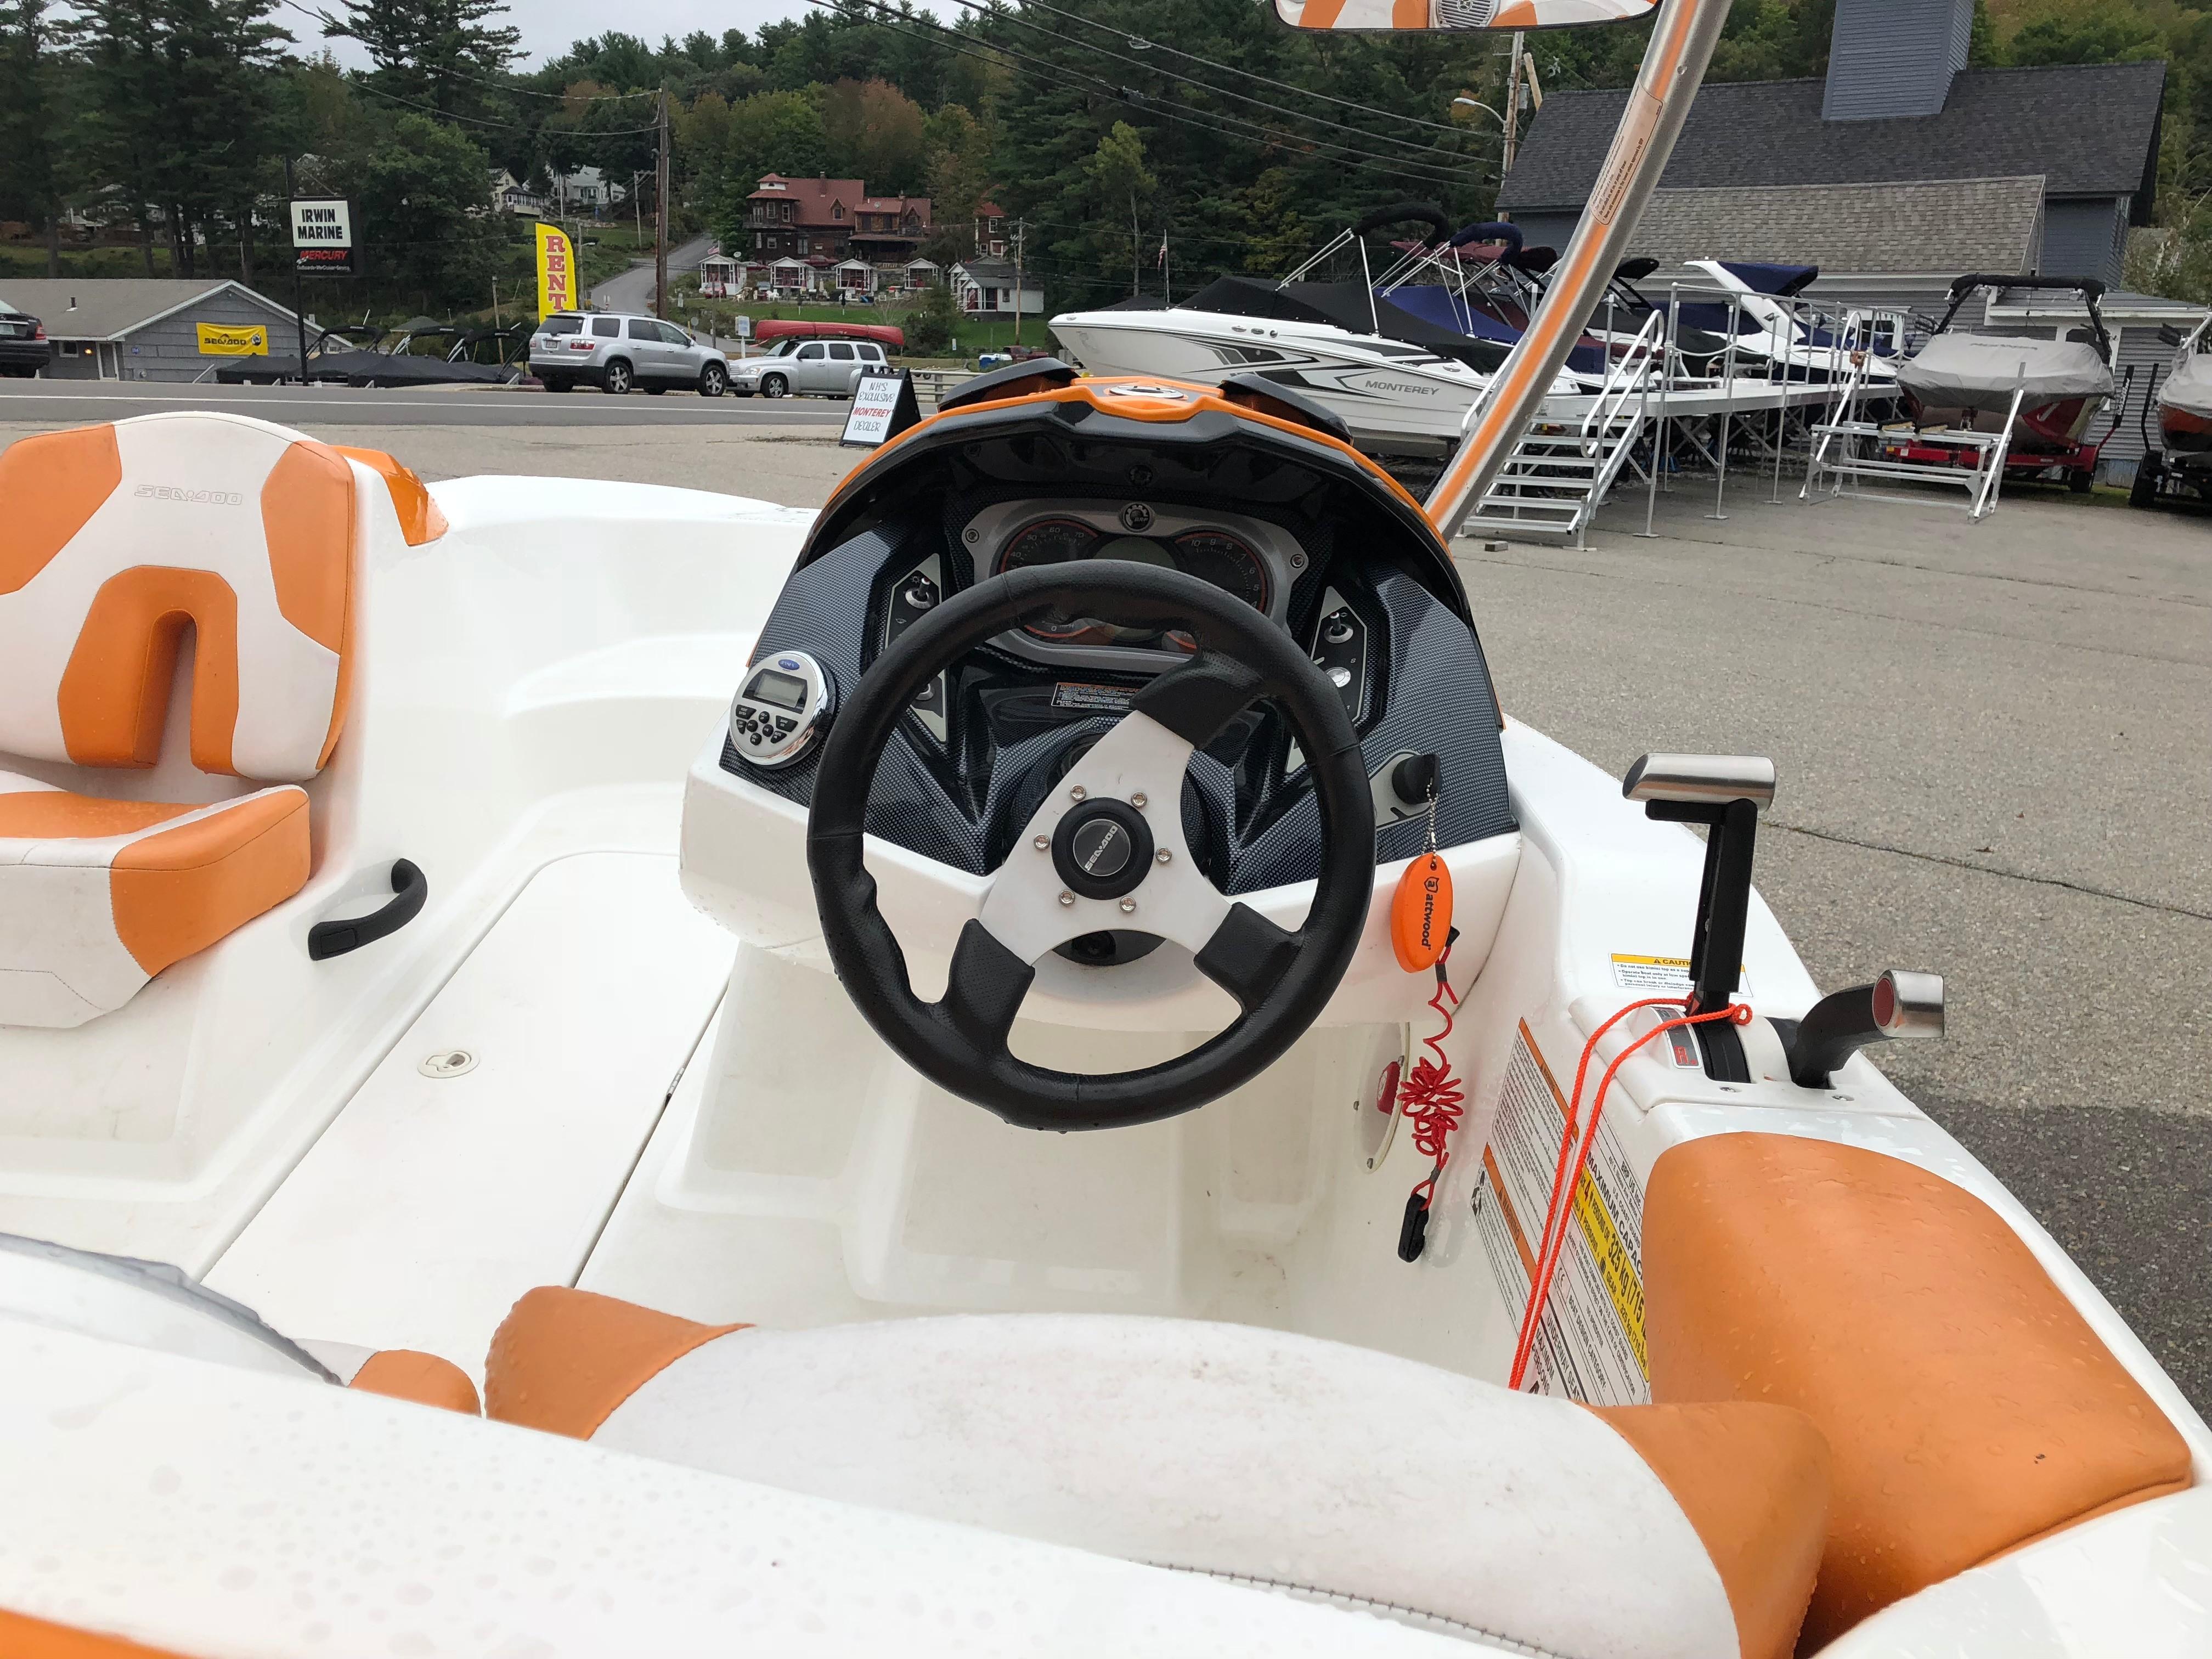 Used 2012 Sea Doo Sportboat Speedster 150 For Sale